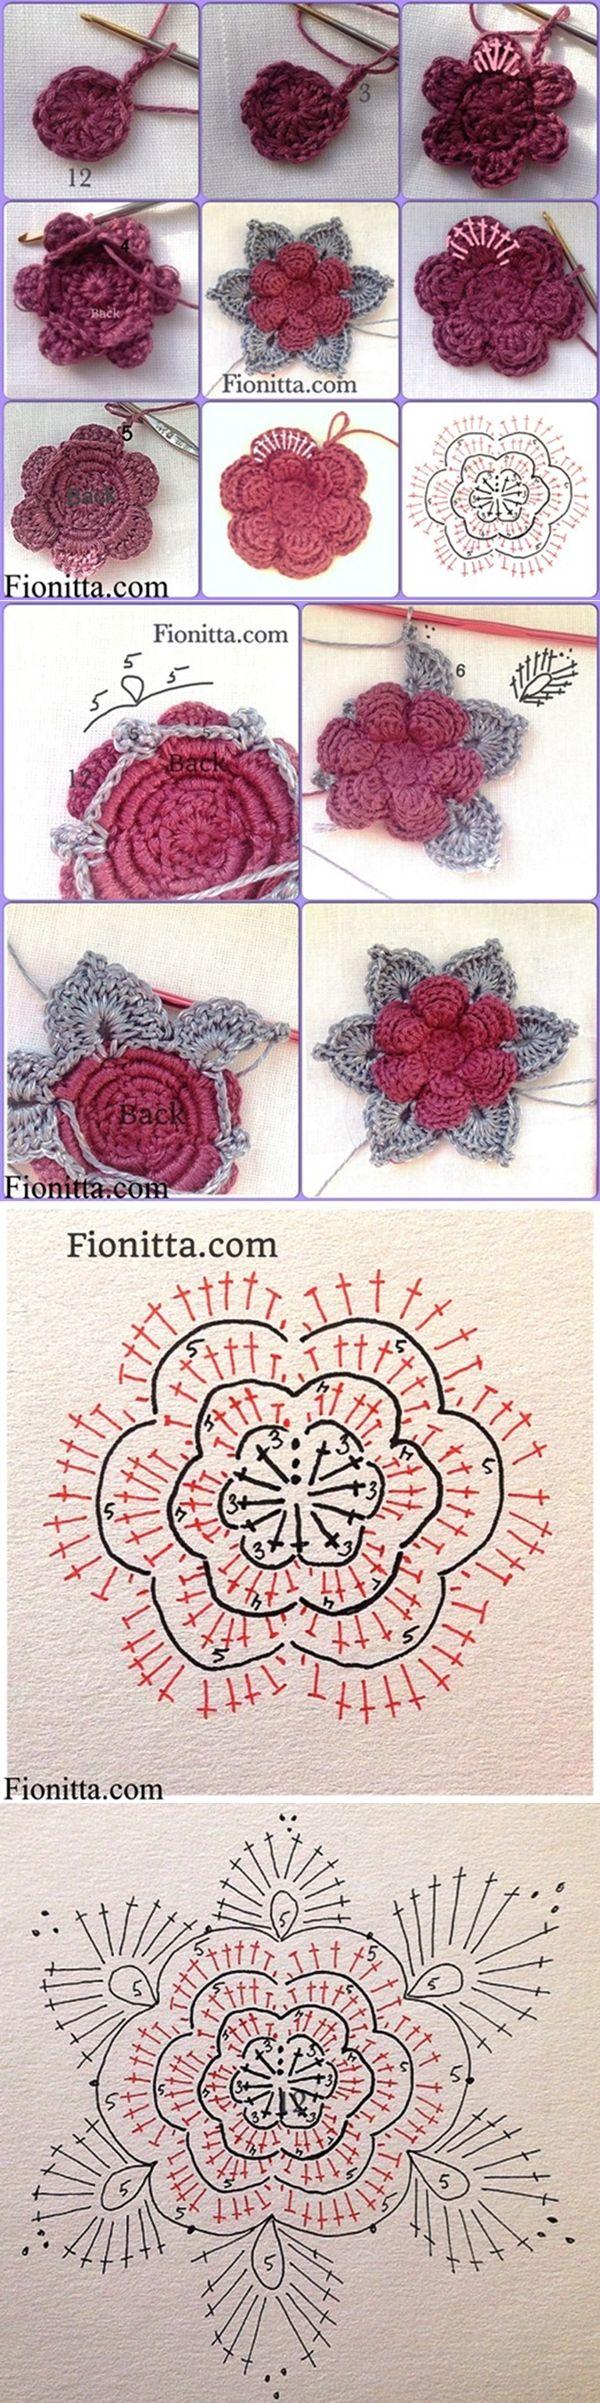 DIY 3D Crochet Rose. •✿• Teresa Restegui http://www.pinterest.com/teretegui/ •✿•